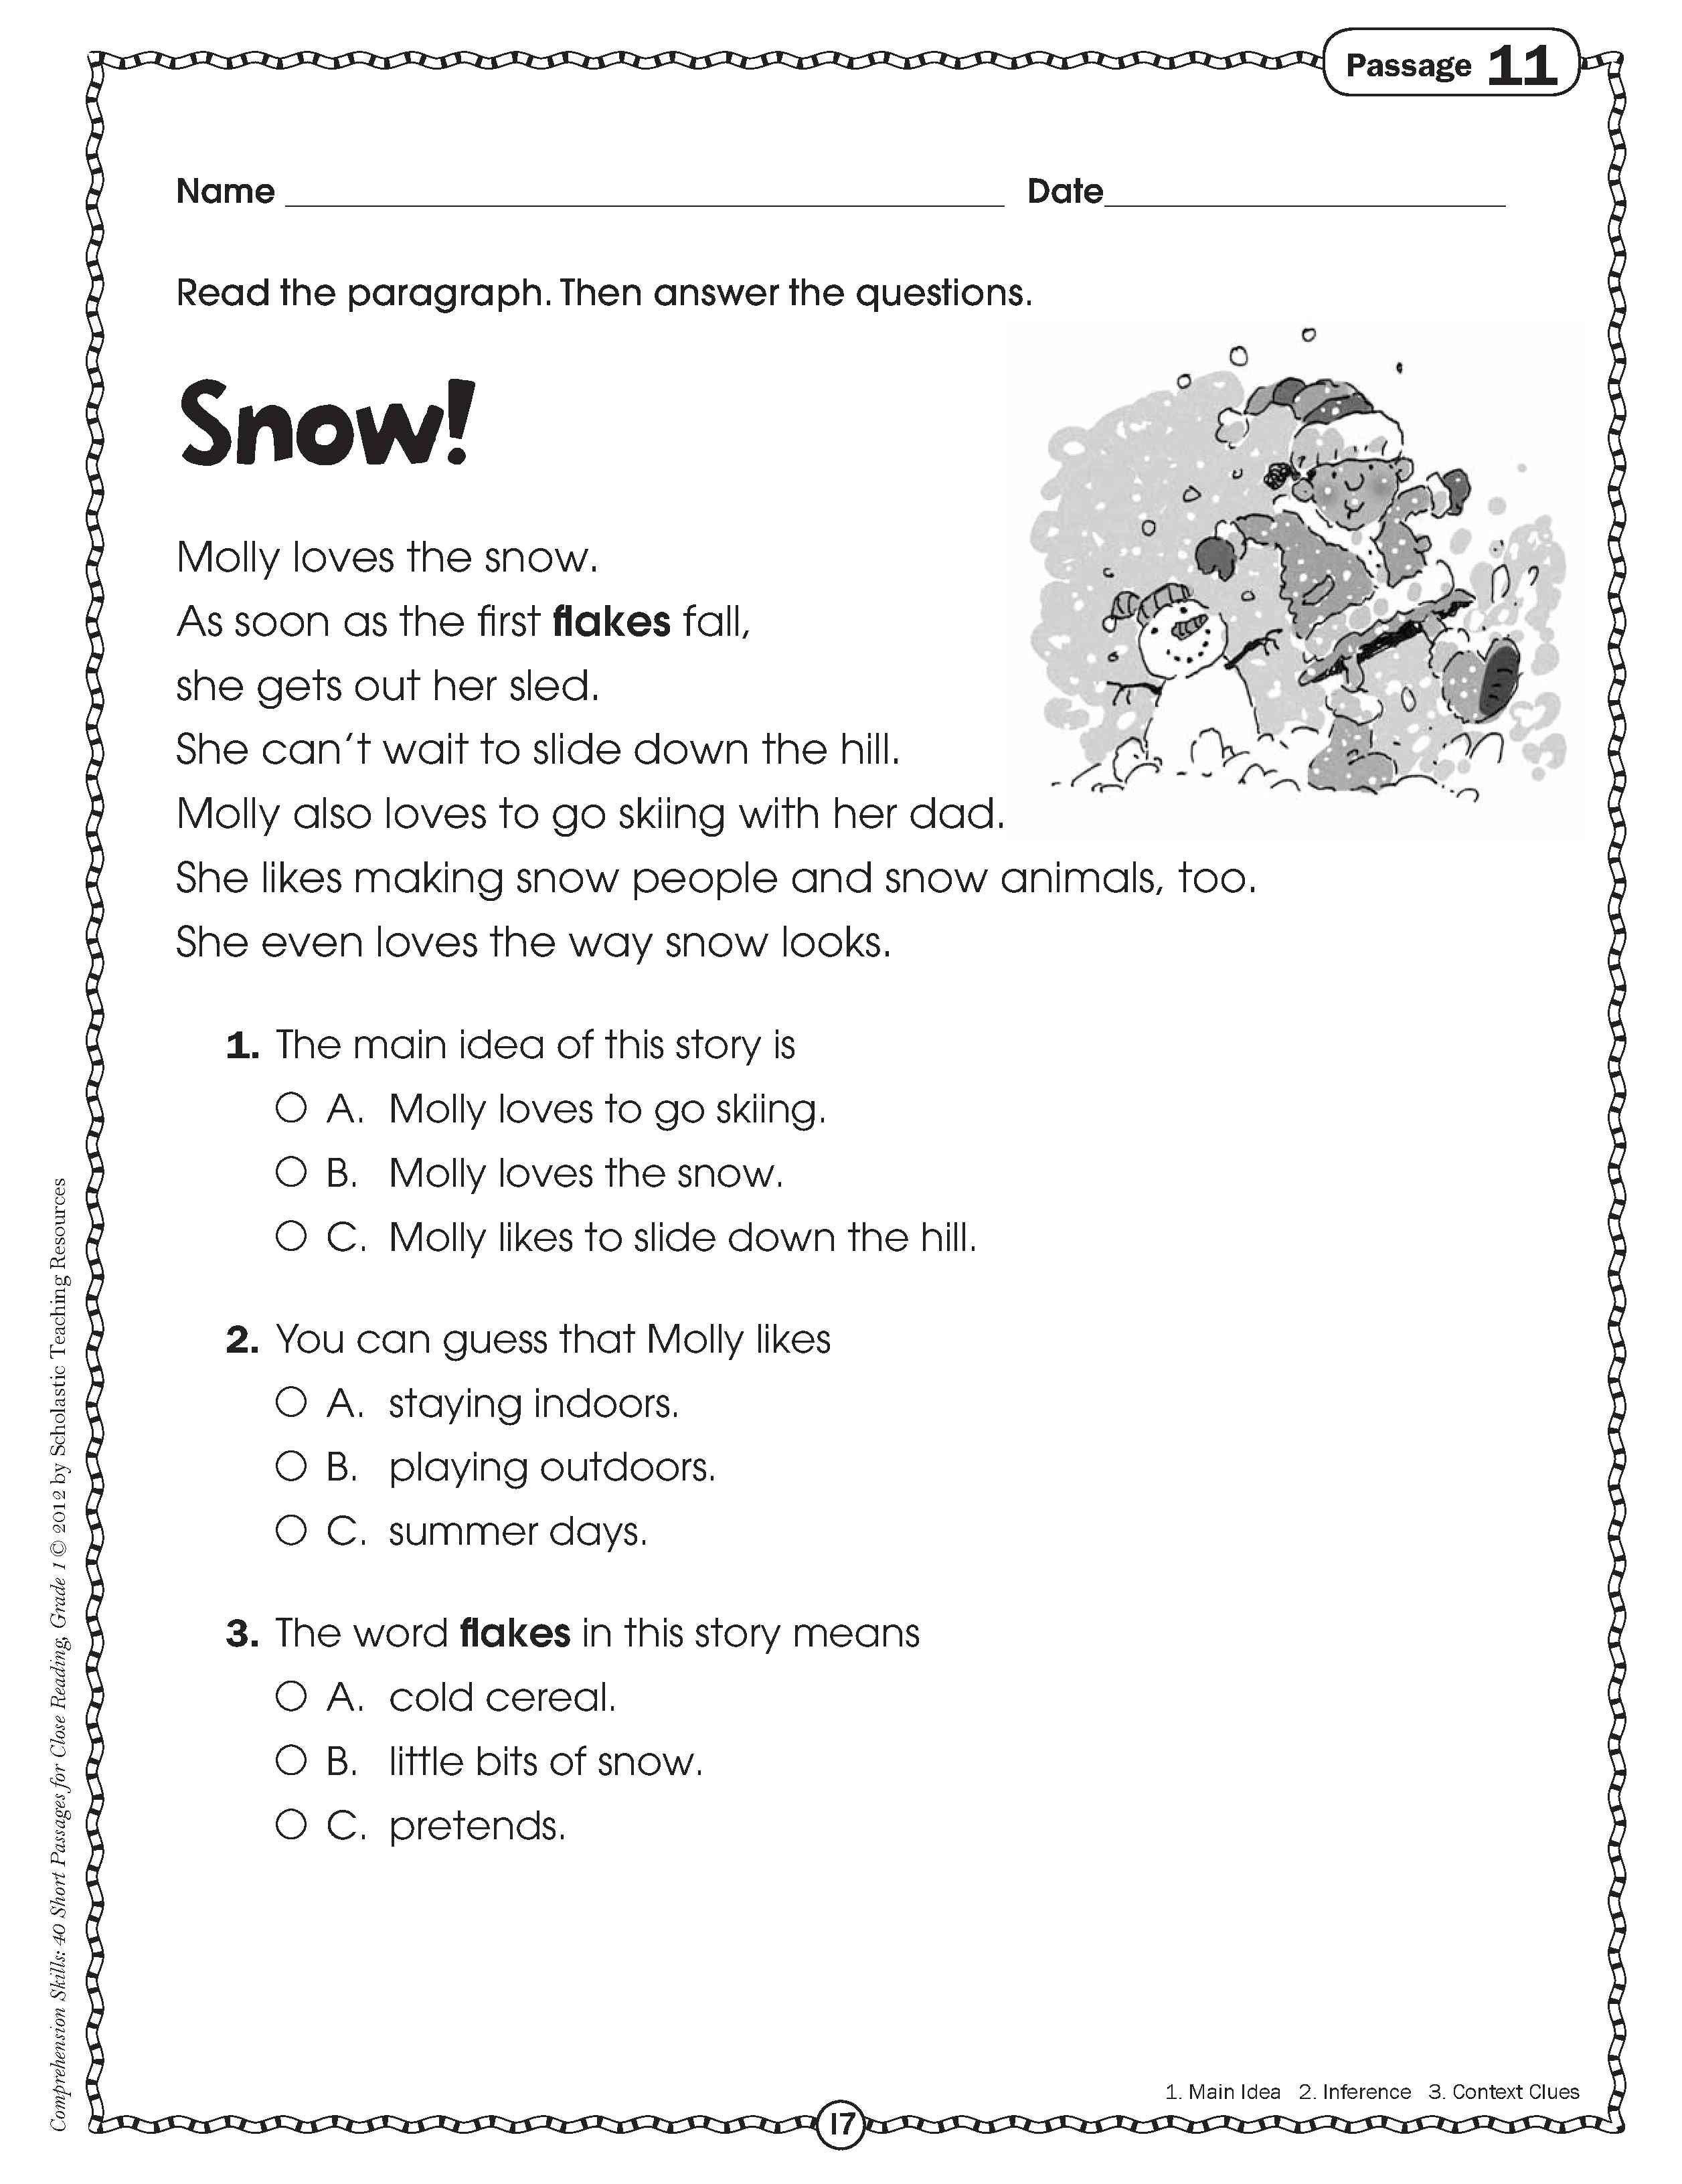 10 Stylish Main Idea Worksheets For 2Nd Grade comprehension worksheets main idea best of sample 3rd grade 3 2021